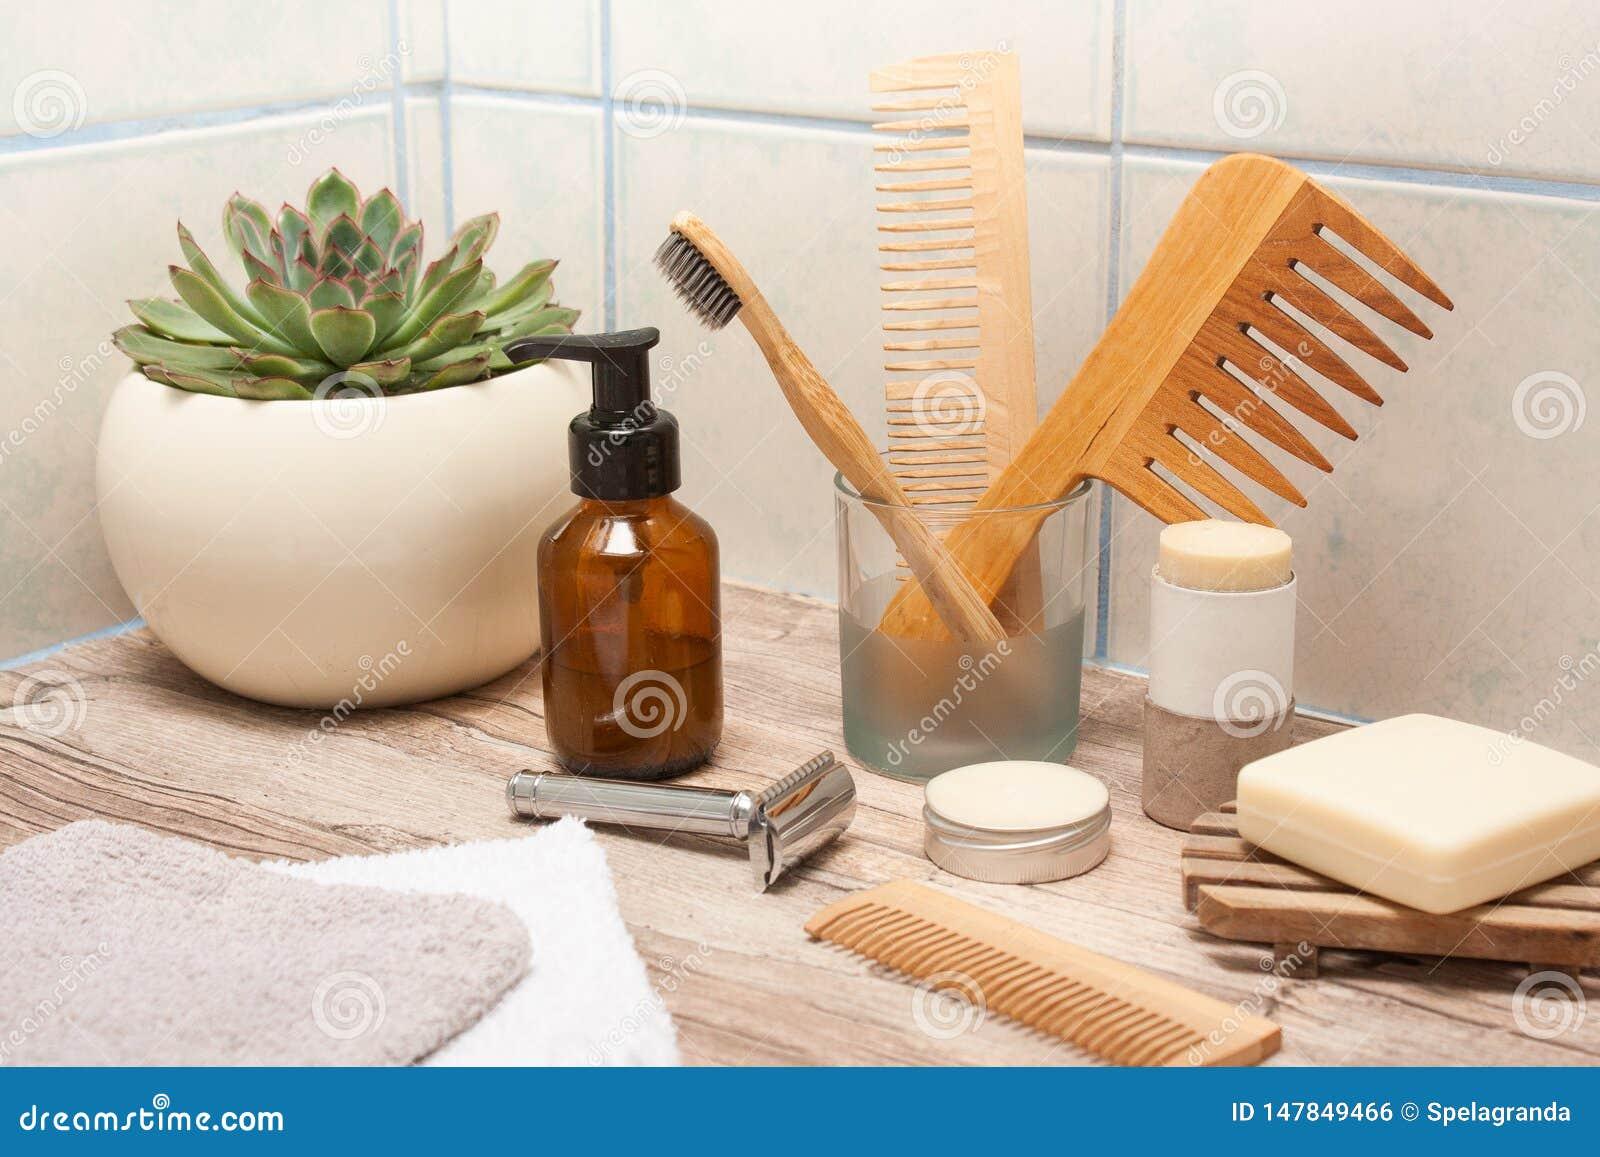 Zero Waste Ecological Bathroom Essentials Stock Photo ...